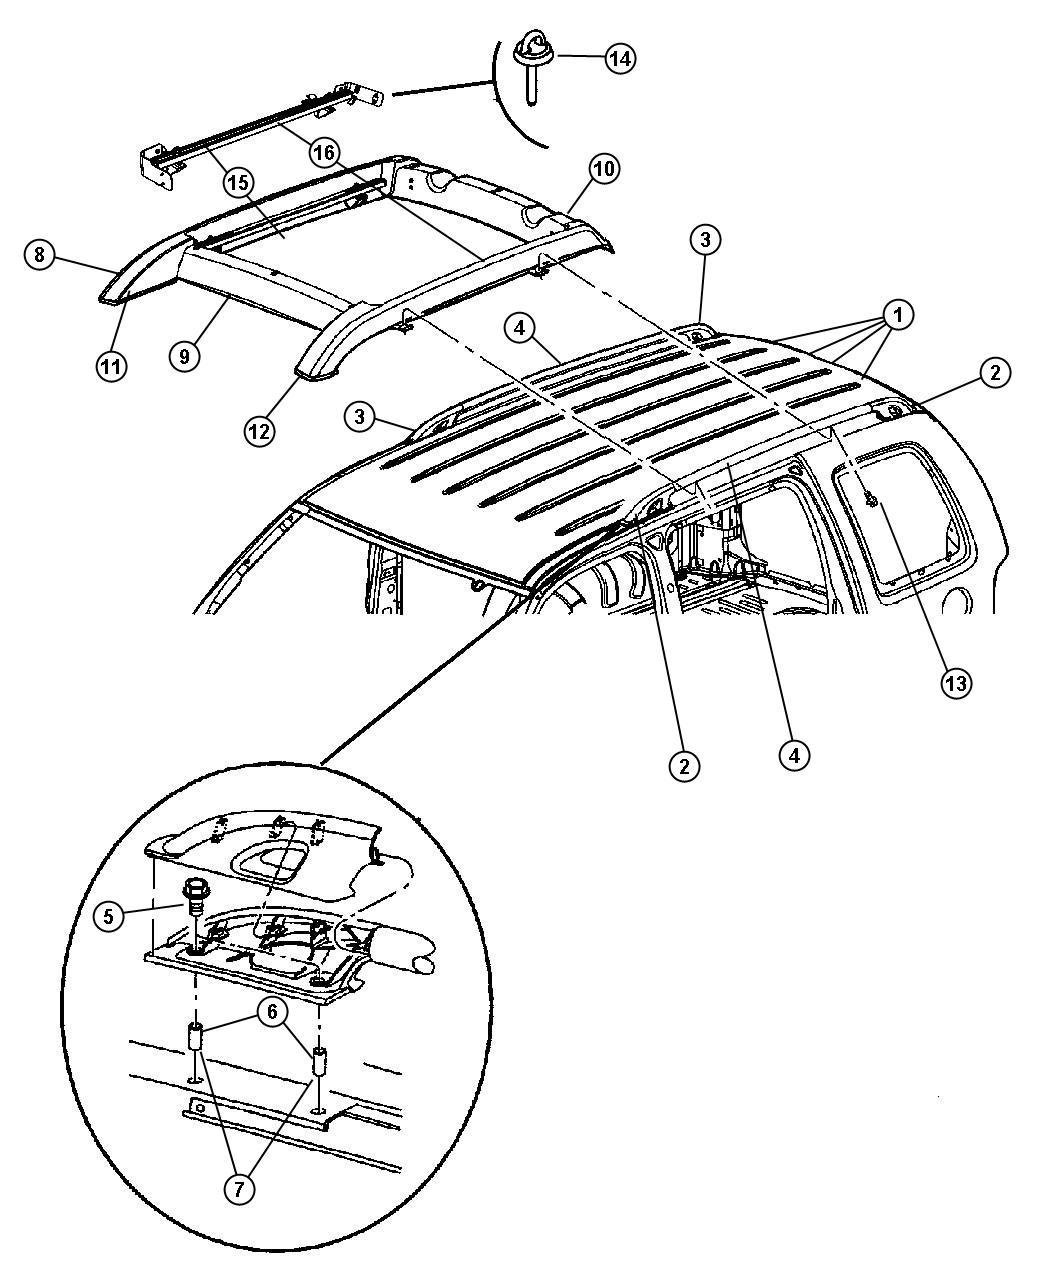 Jeep Liberty Skid Strip  Roof Rack  Basket